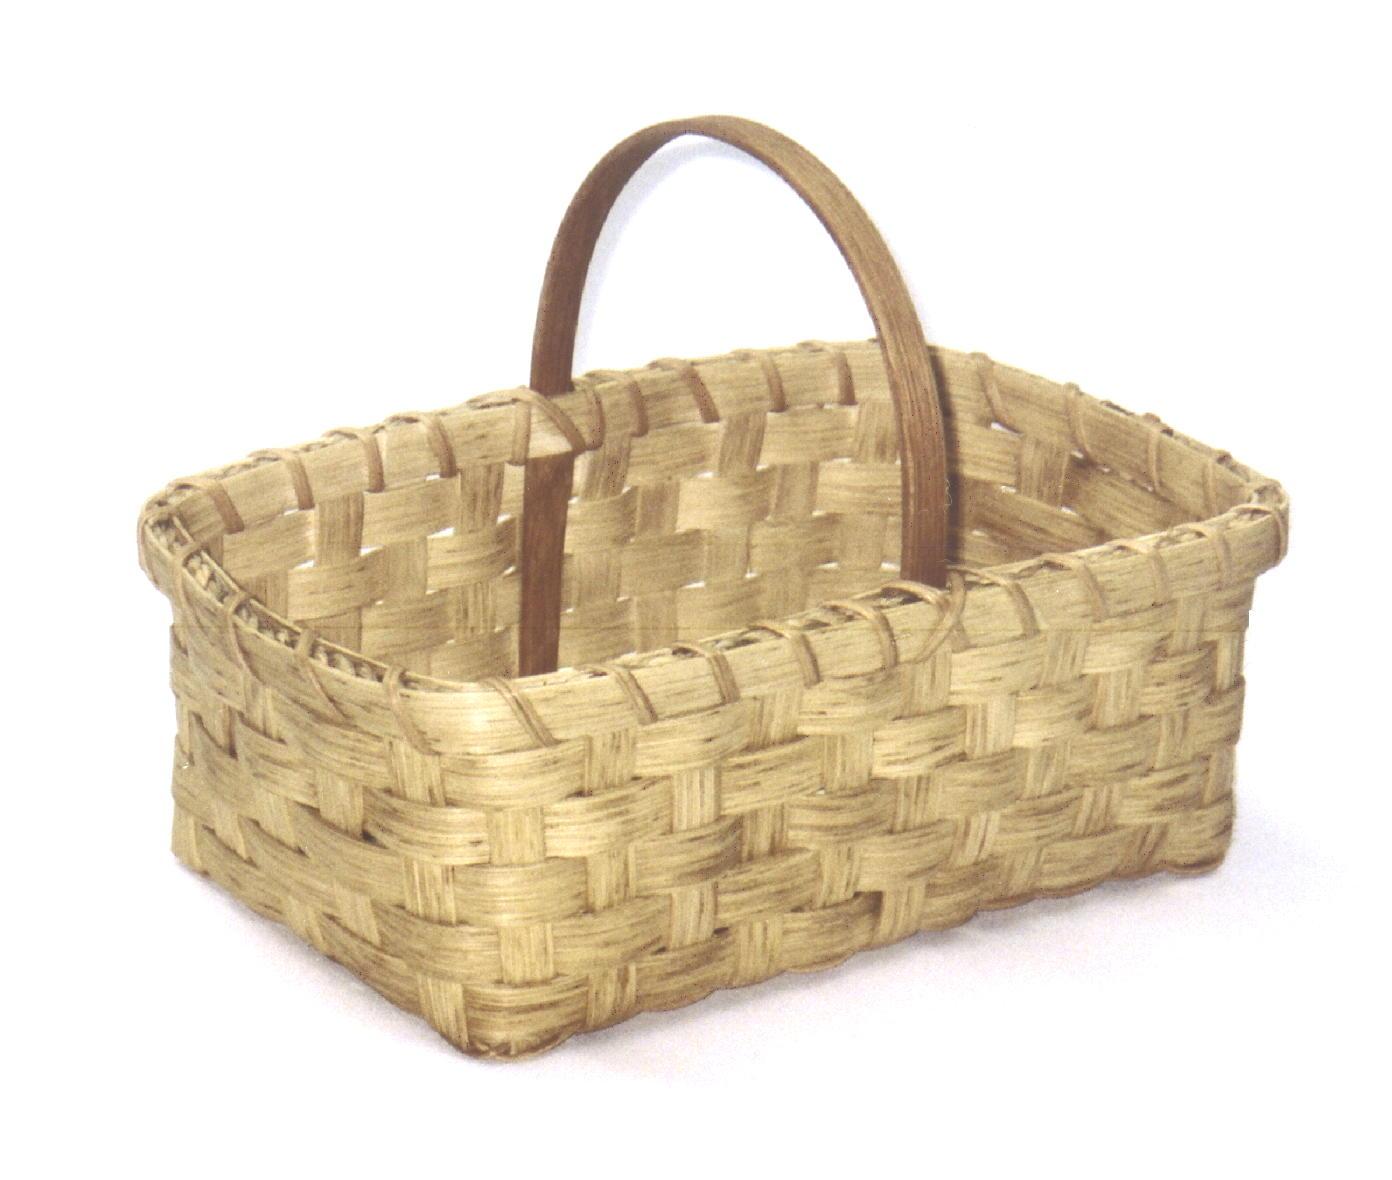 Woven Disc Basket : Just patterns highlights